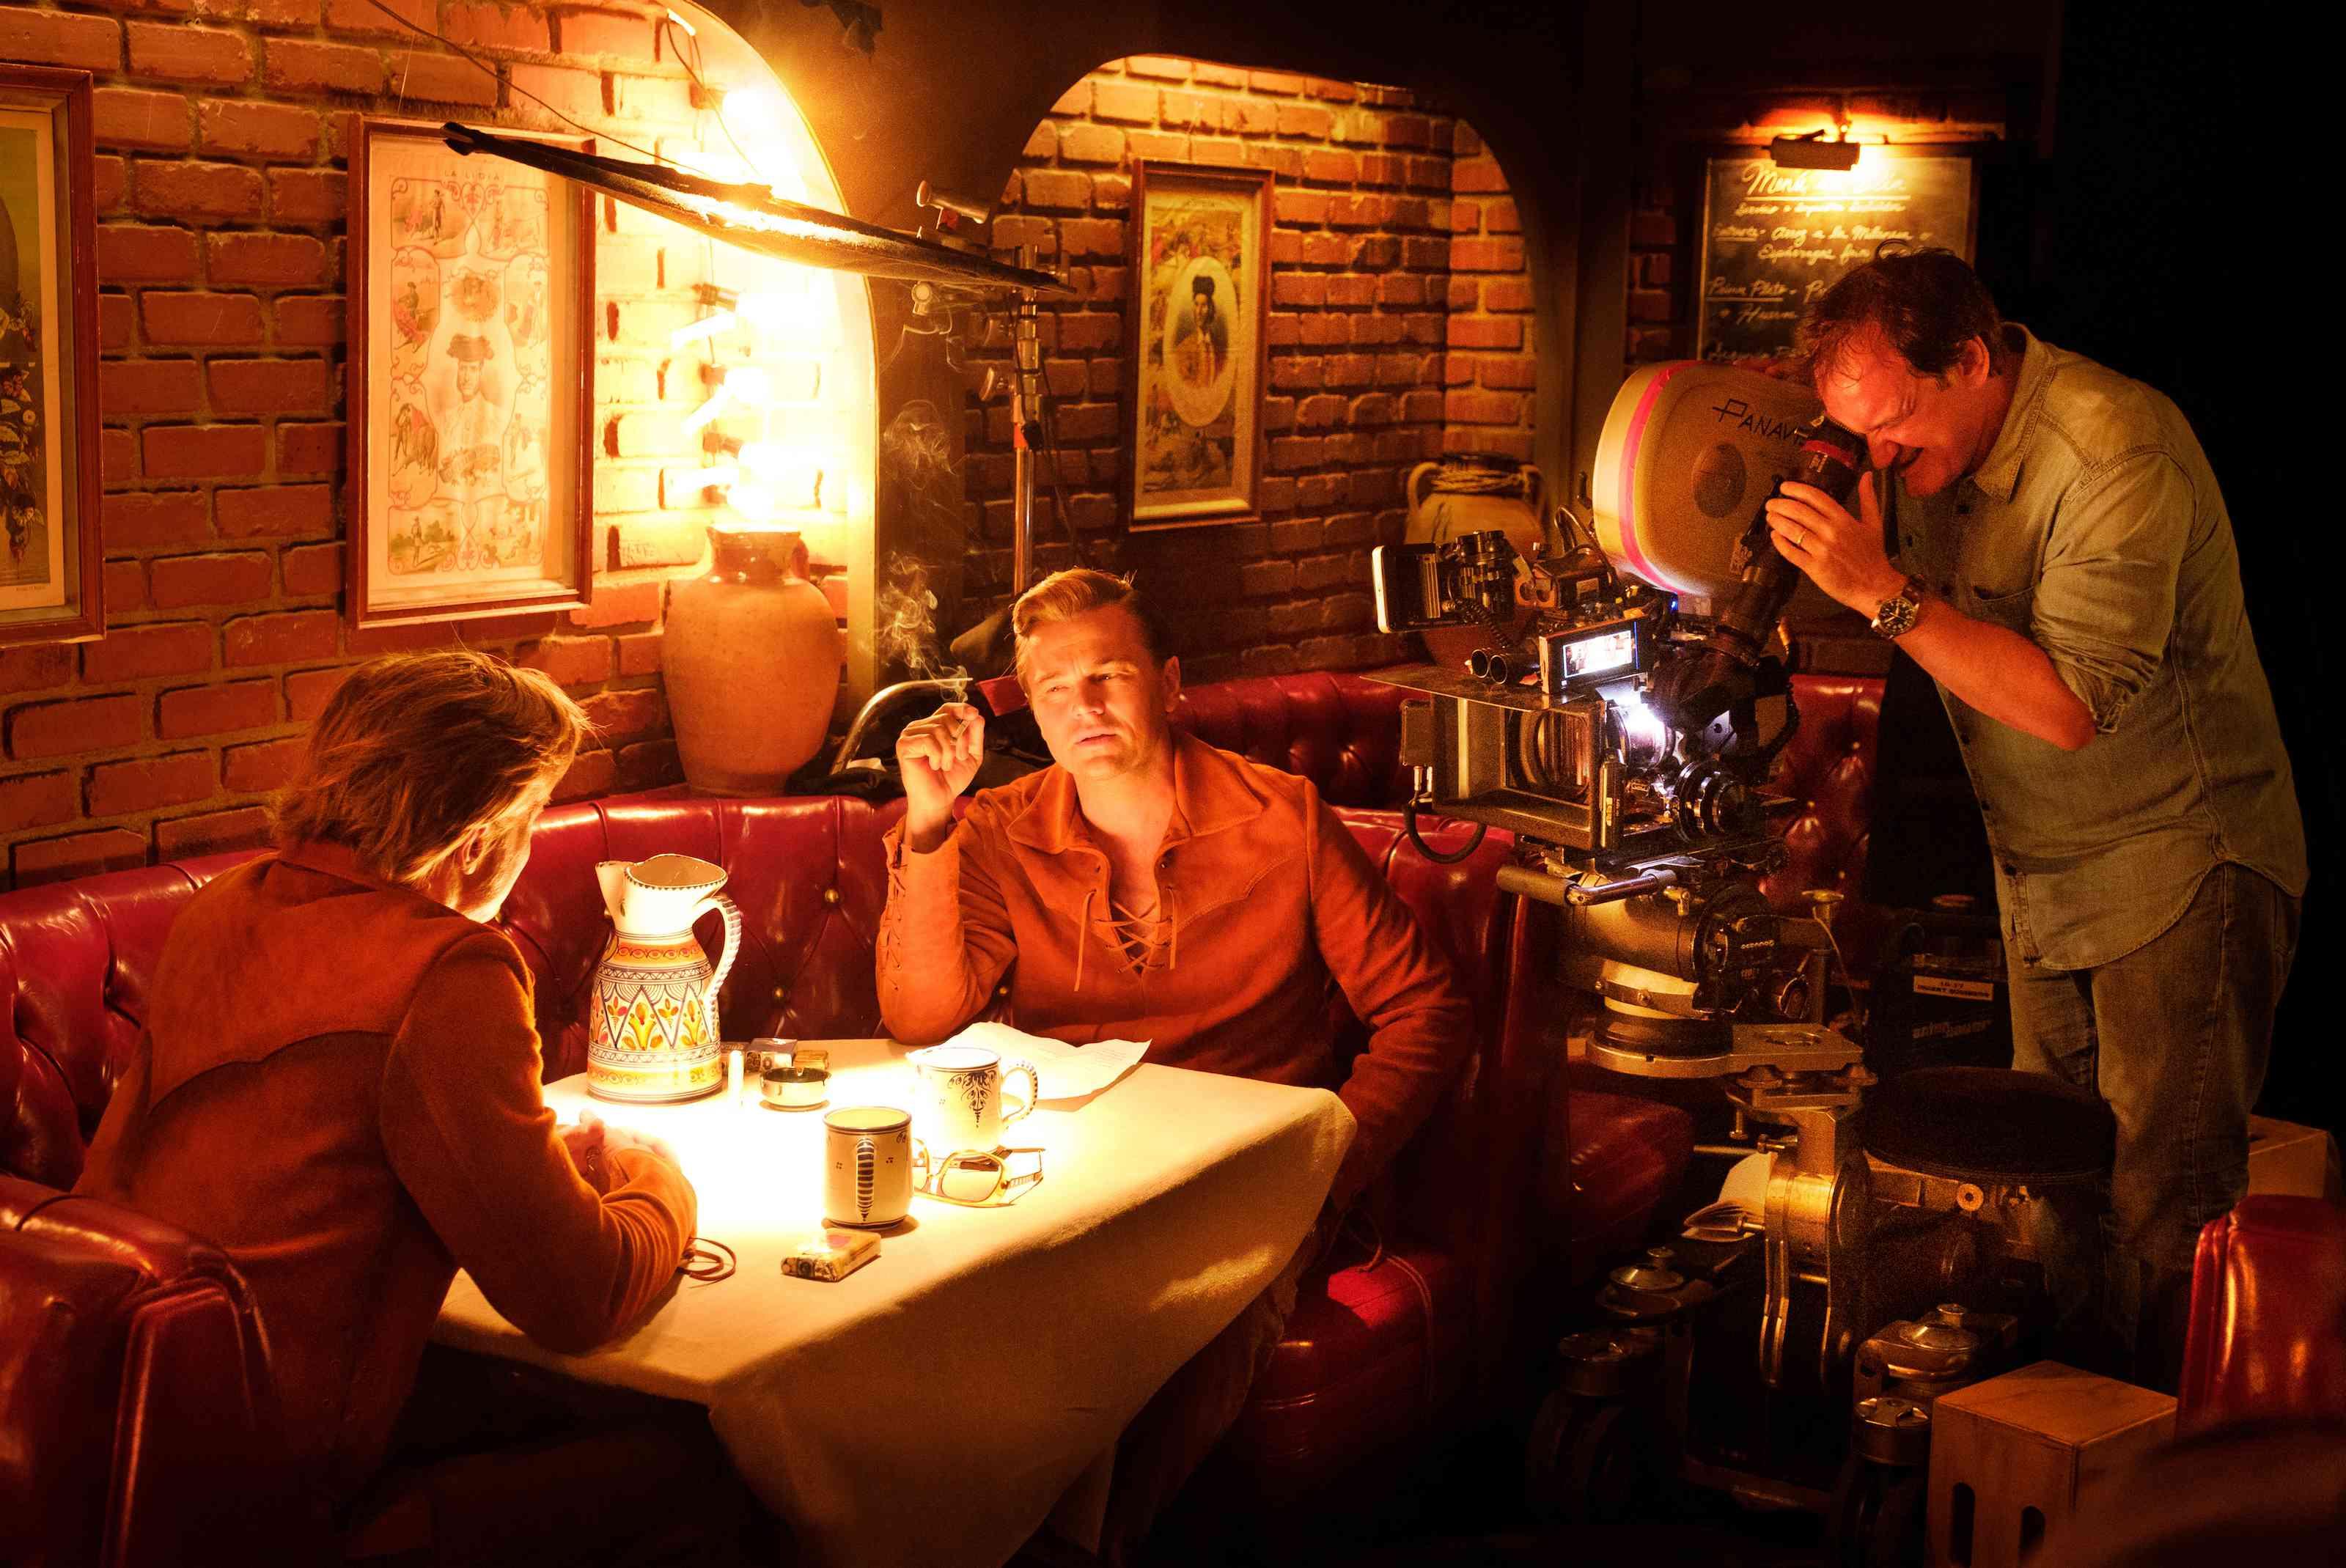 Pitt, DiCaprio, and Tarantino at Casa Vega